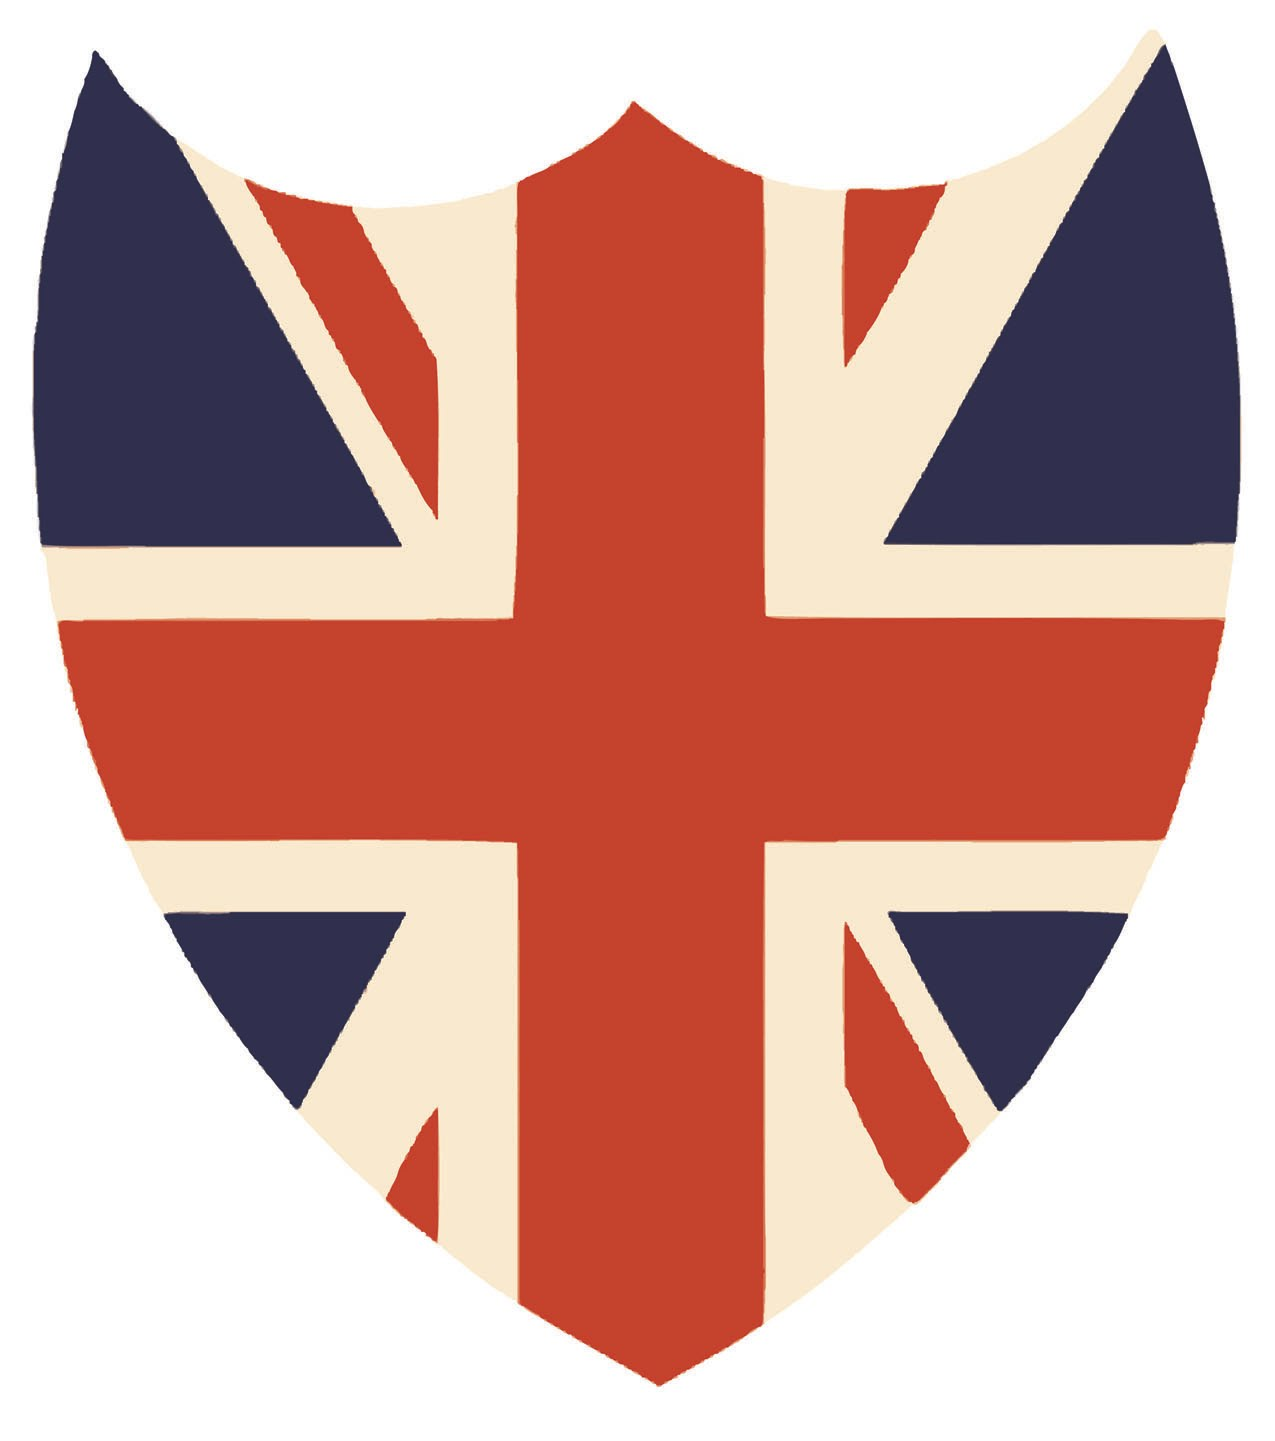 Best Iron On Transfer Paper! - Union Jack Shield Pillow